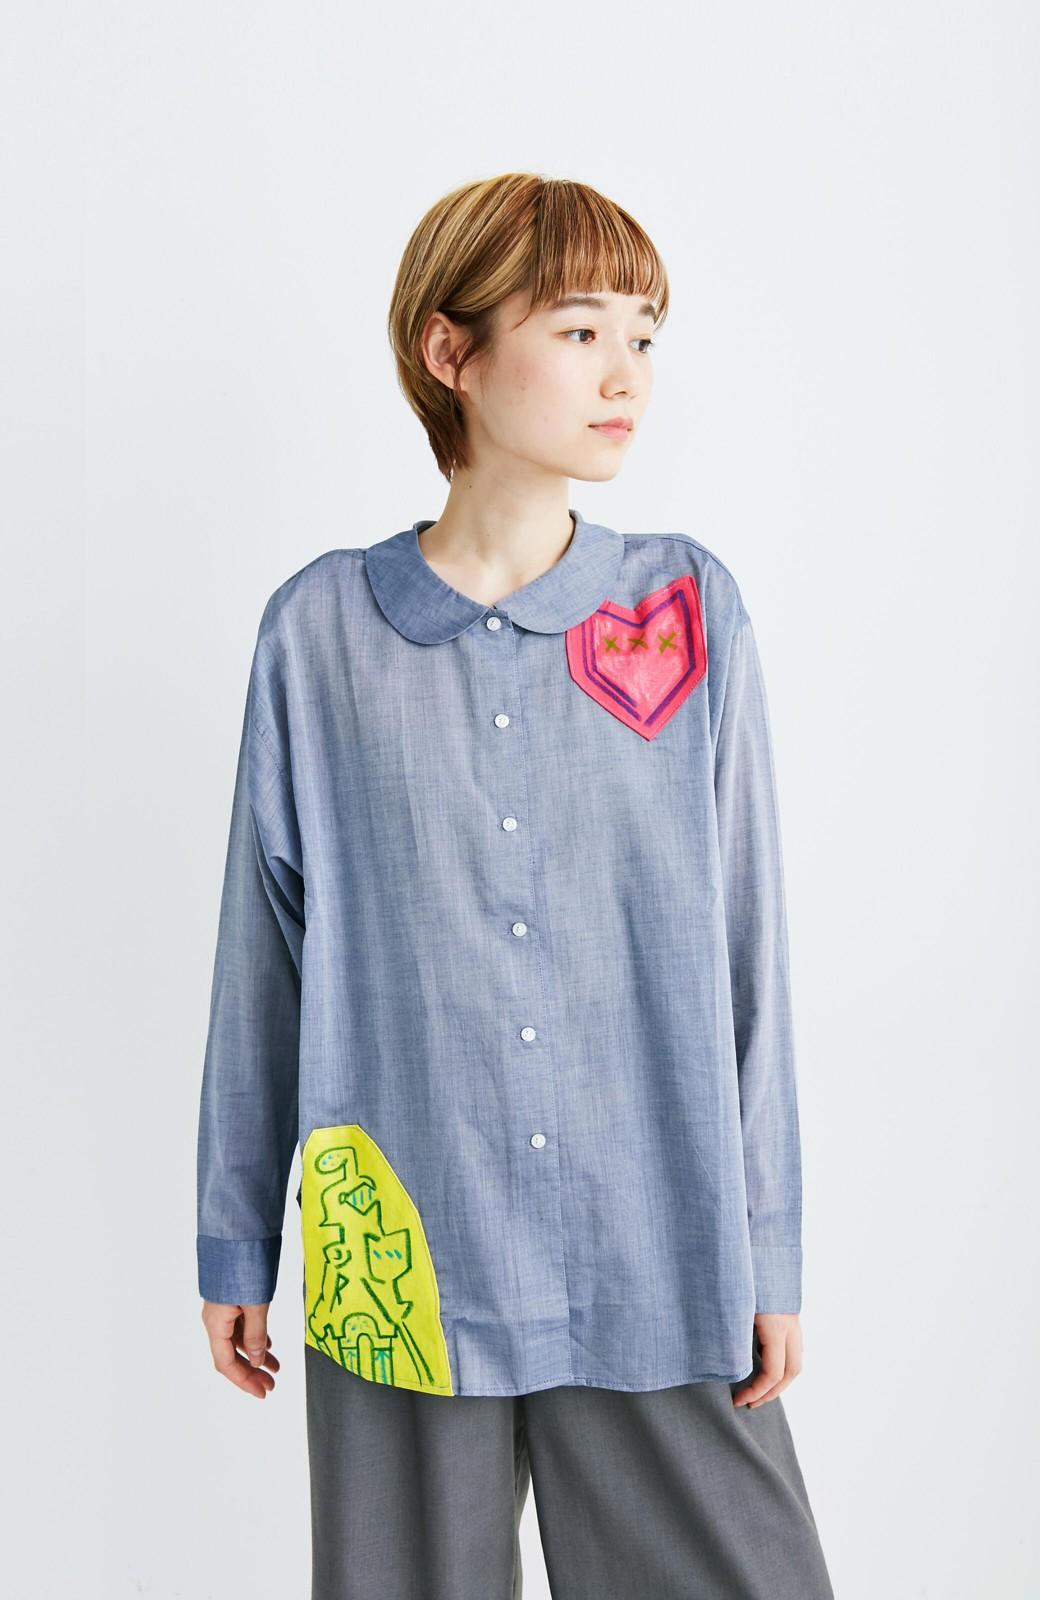 haco! co&tion 遠山敦丸えりシャツ【アーティスト監修10点もの】 <ブルー>の商品写真3